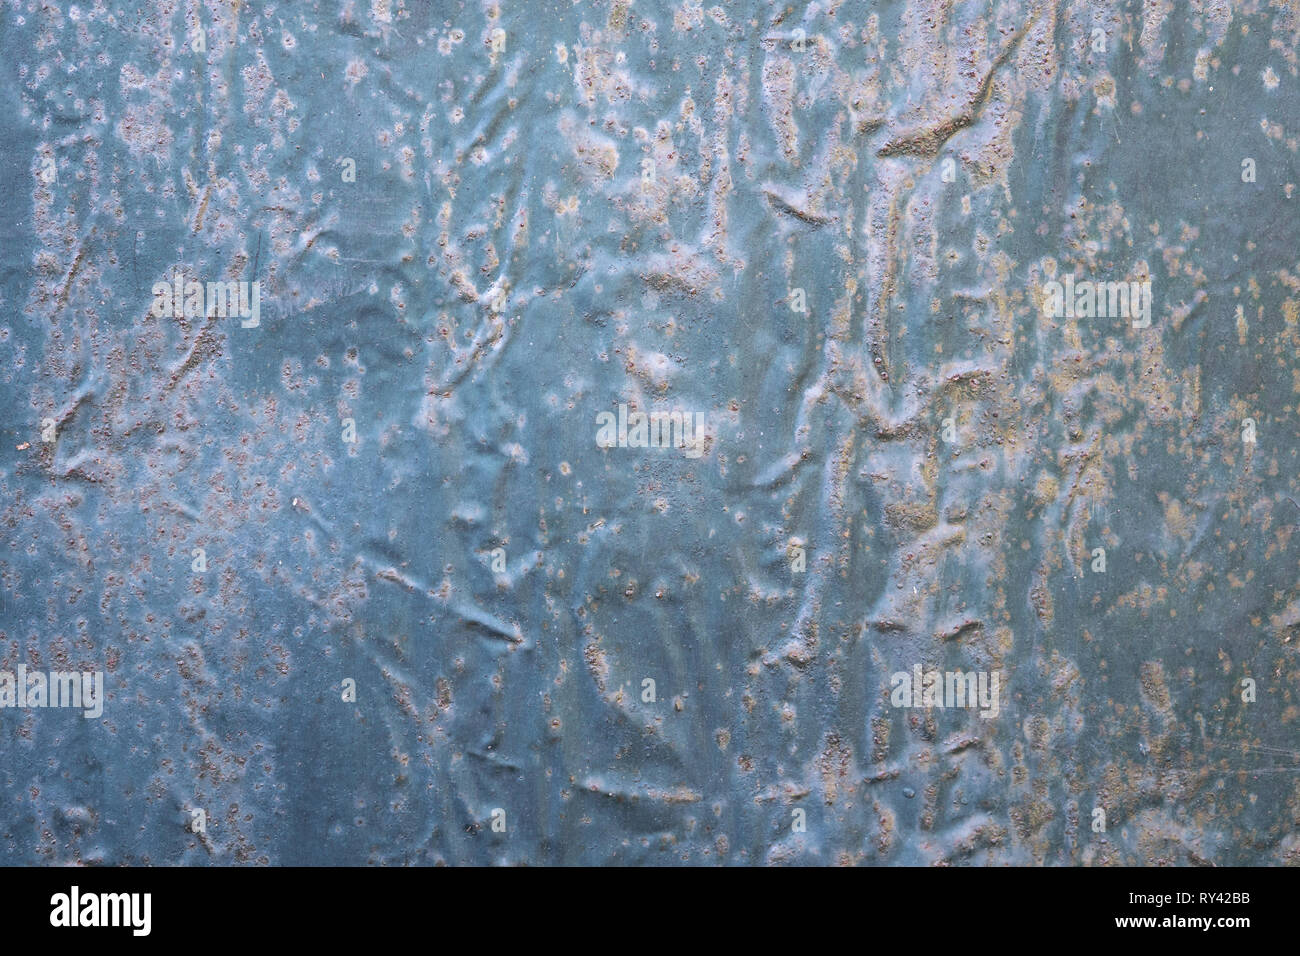 Aged galvanized steel plate. Metallic background texture - Stock Image